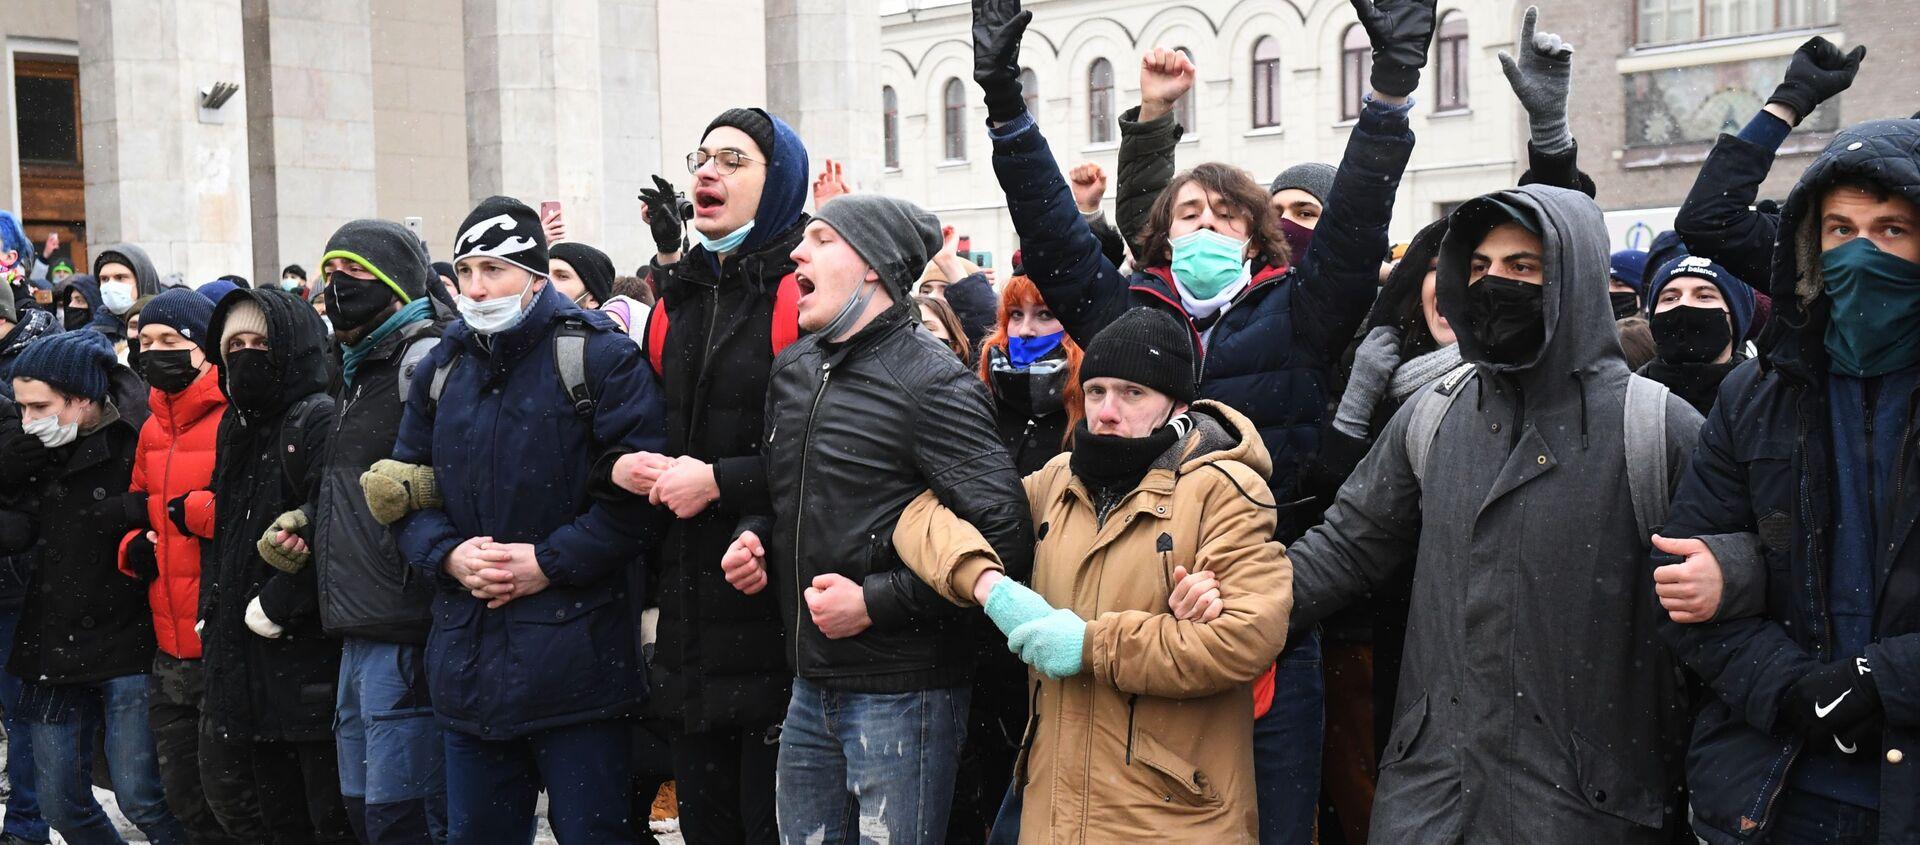 Manifestaciones no autorizadas por Navalni en Moscú - Sputnik Mundo, 1920, 31.01.2021